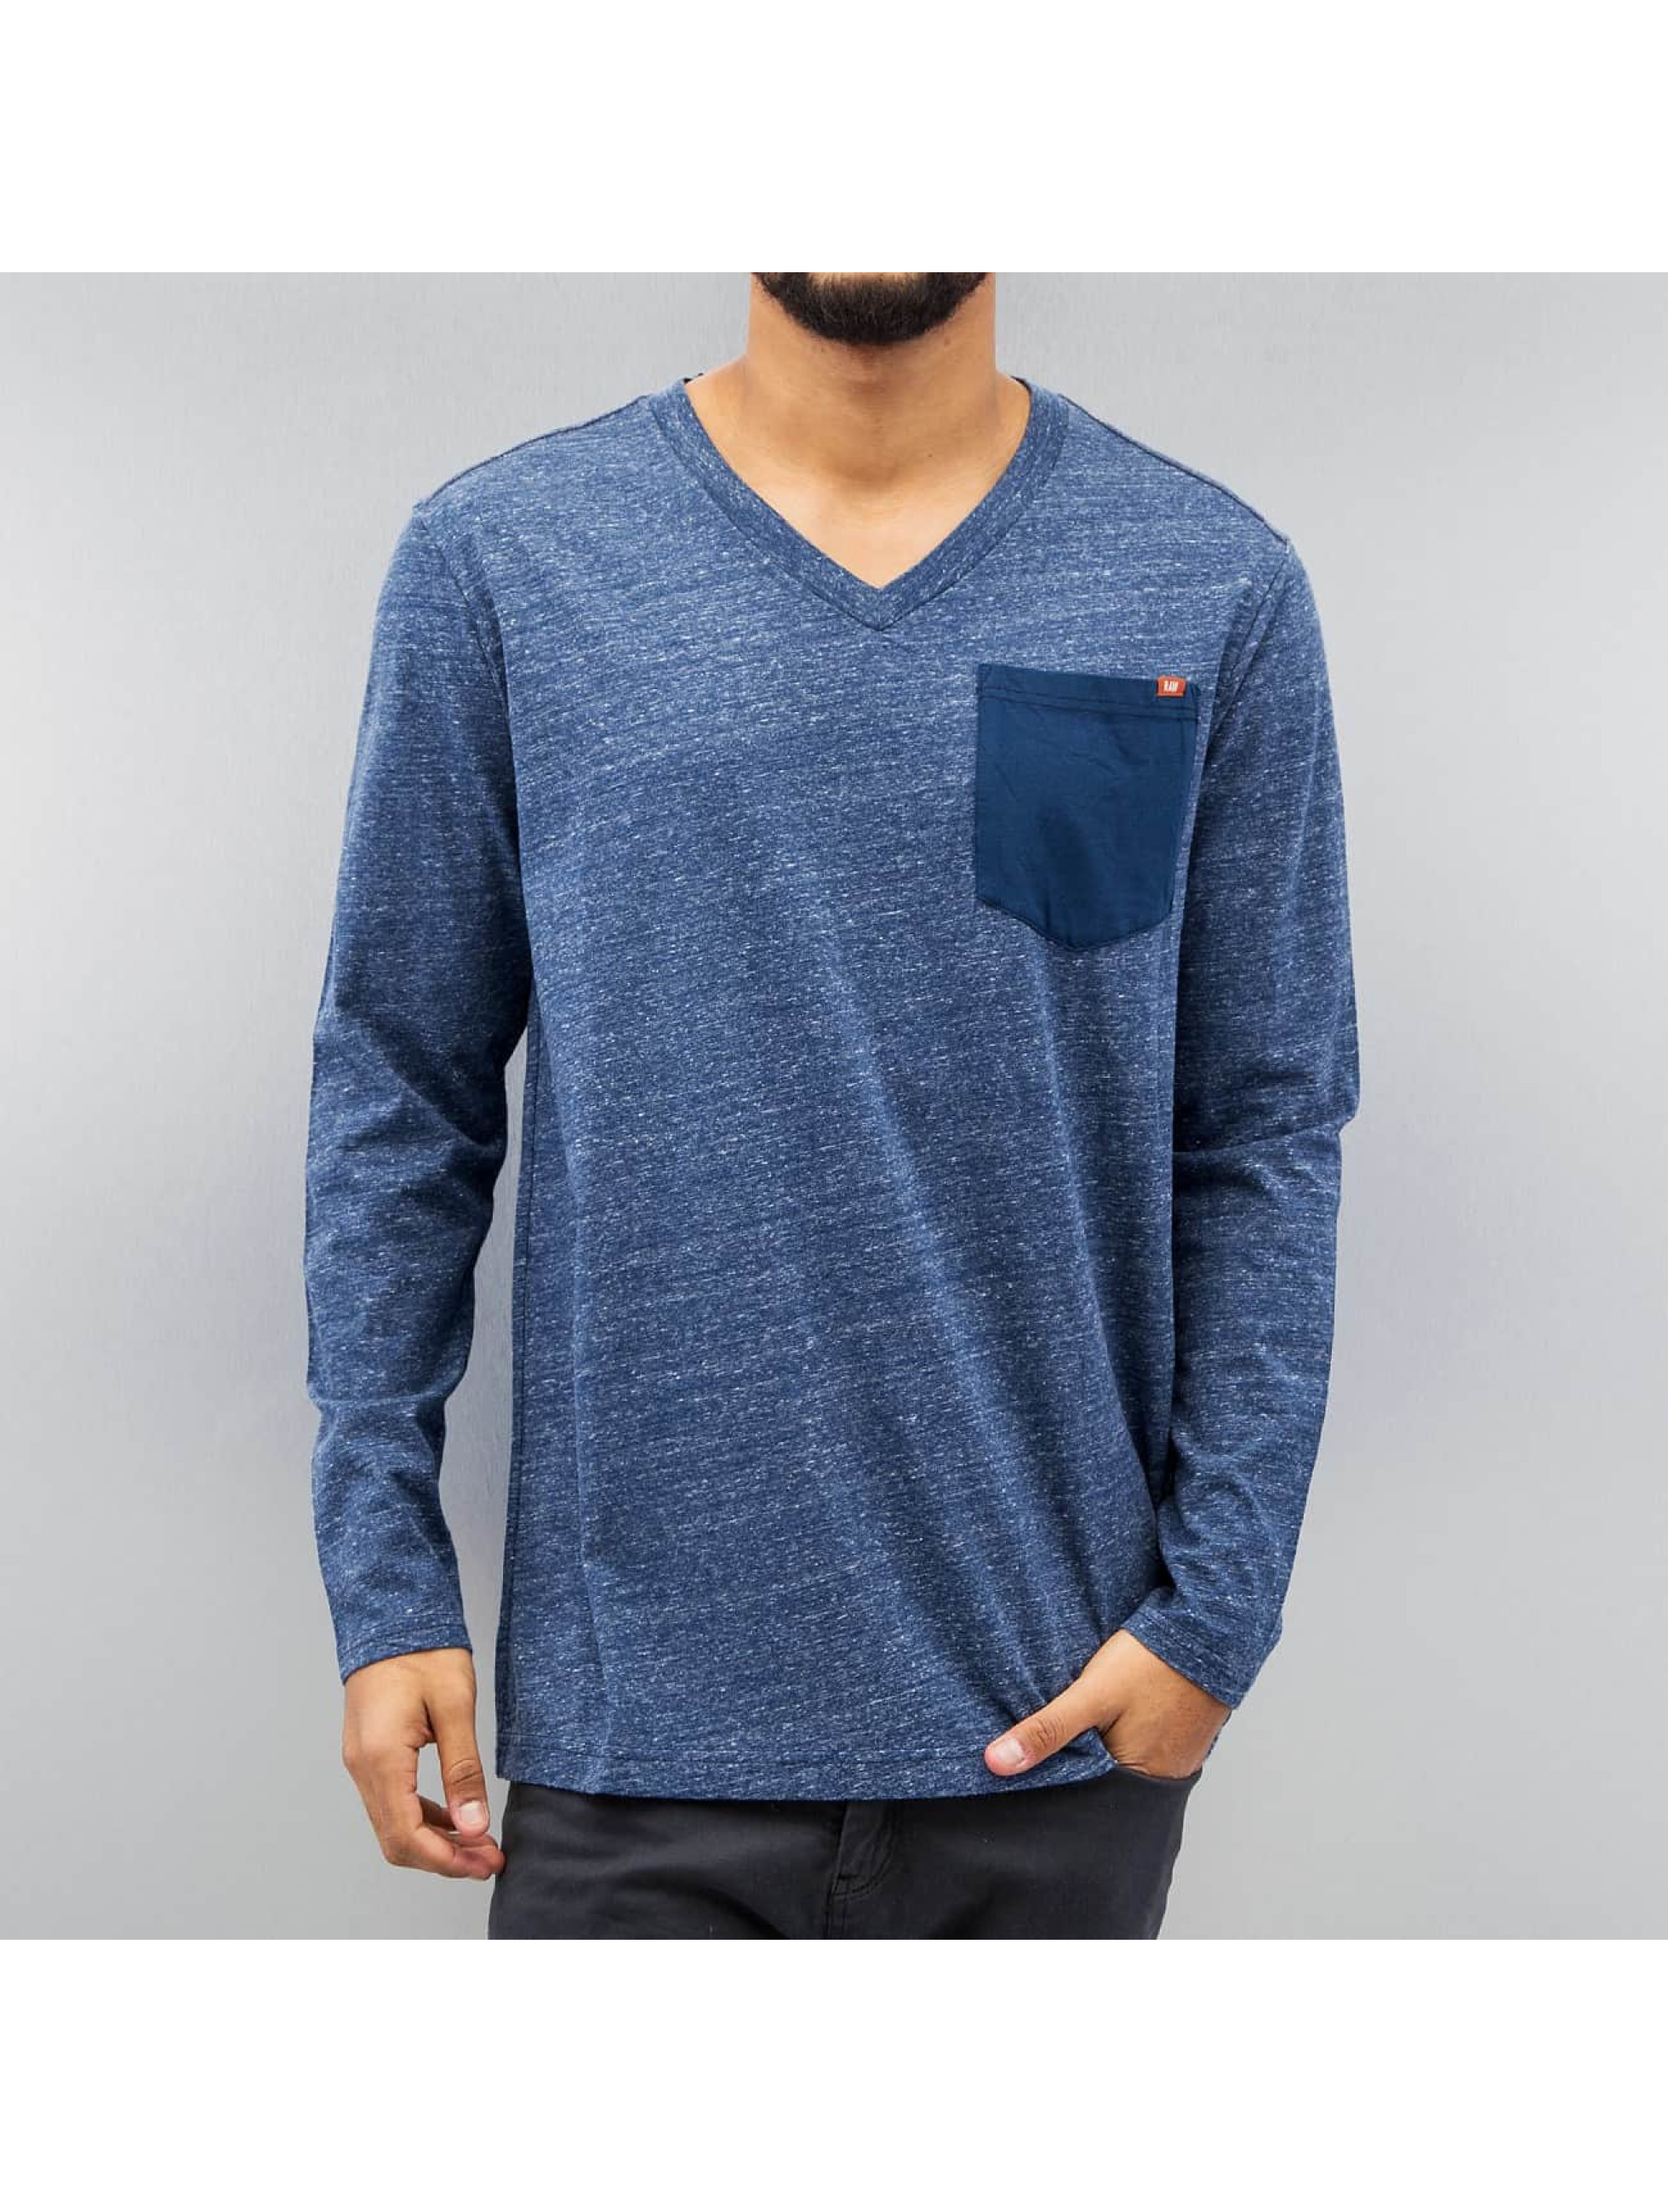 G-Star Longsleeve Riban Pocket Premium Compact Jersey blau